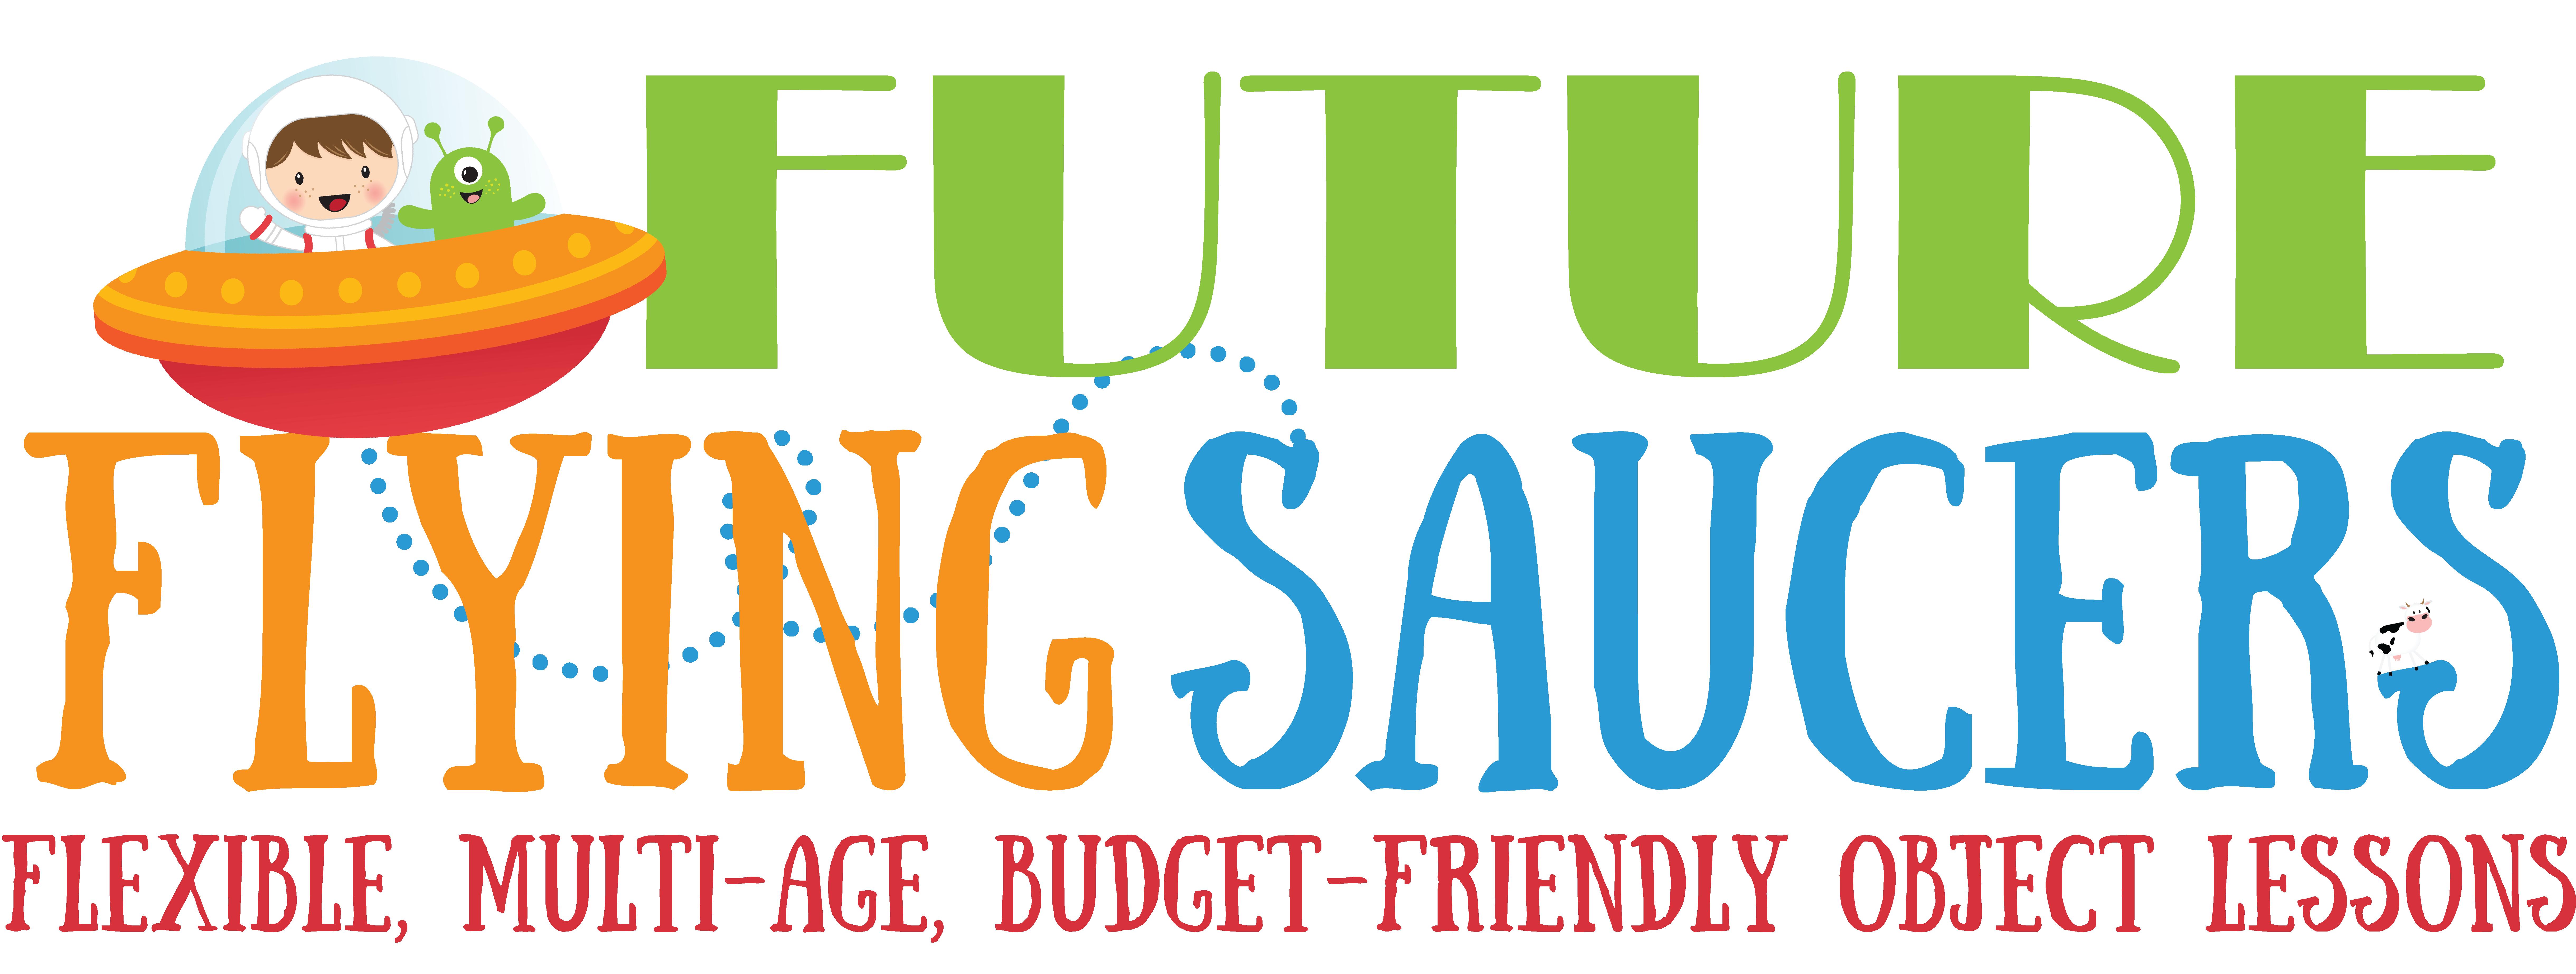 FutureFlyingSaucers Resources